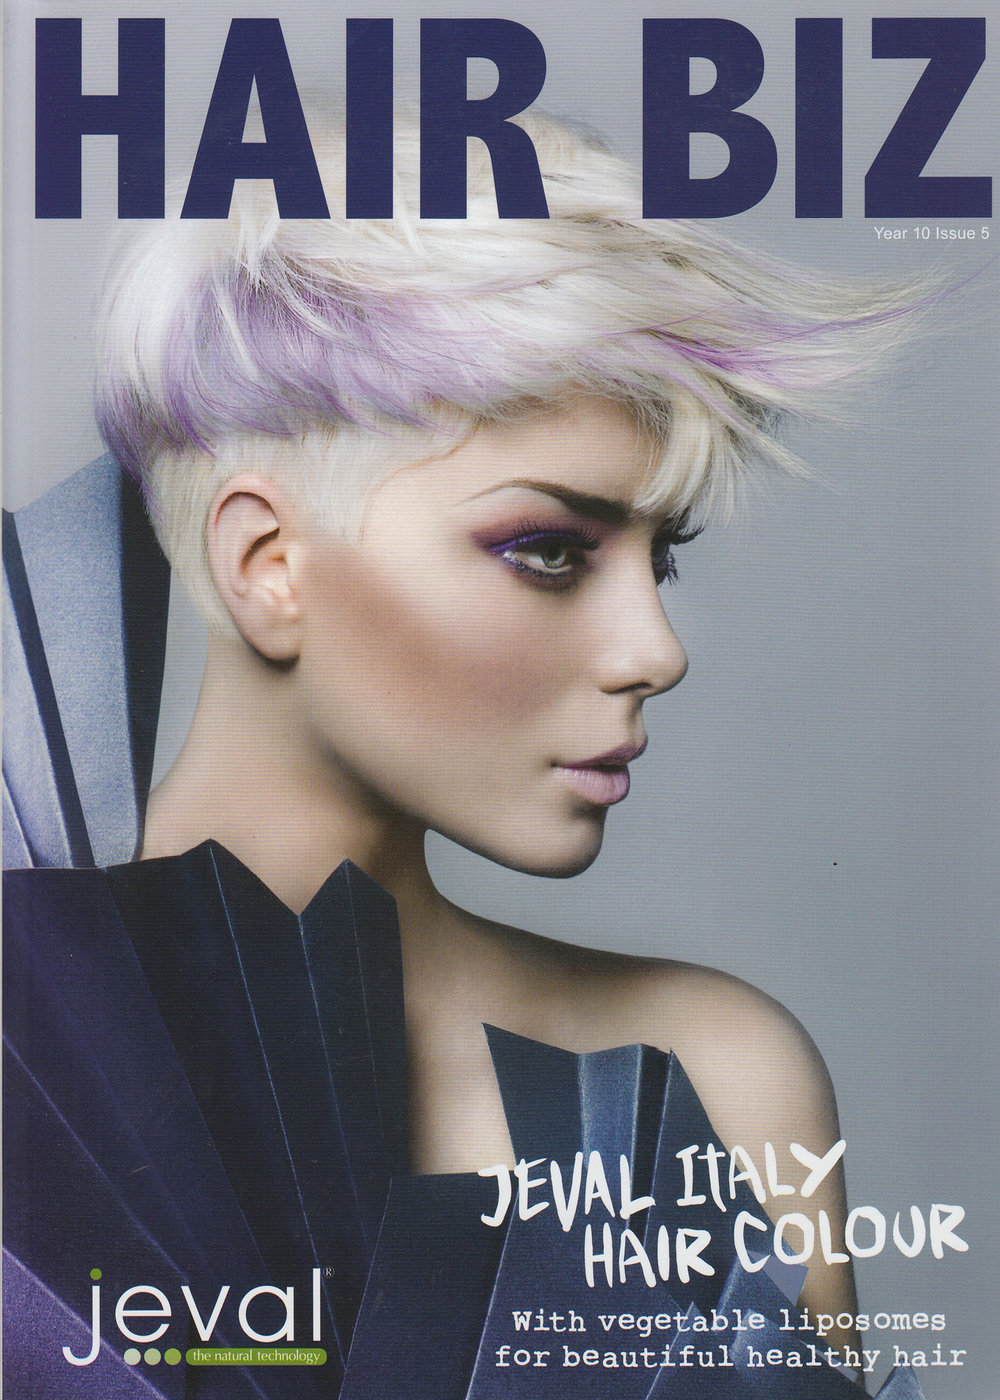 yoshikohair_stkilda_melbourne_hairdresser_hairsalon_hairbiz15_cover